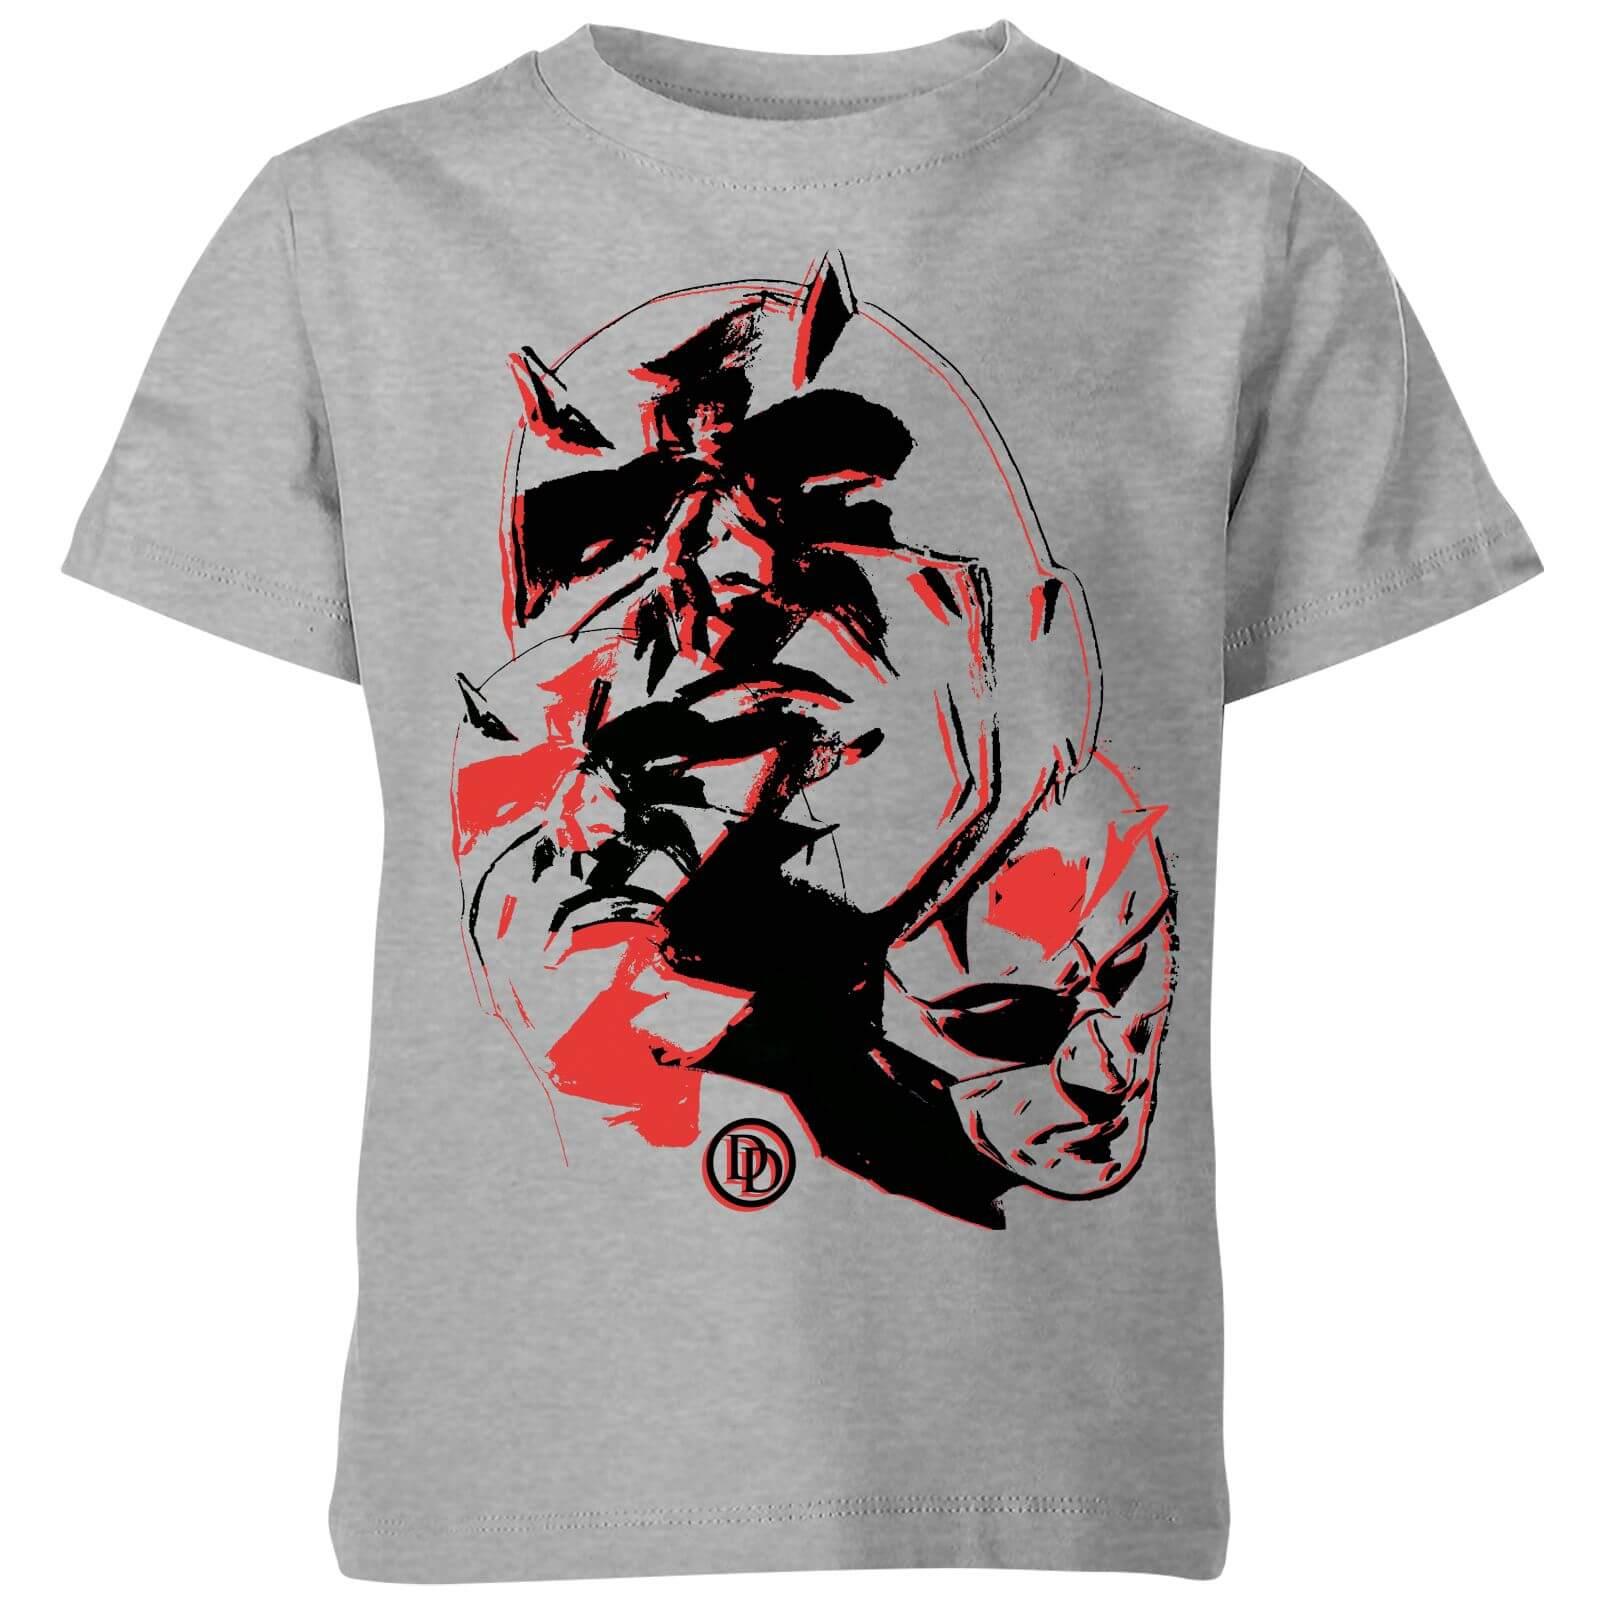 OfferteWeb.click 11-t-shirt-marvel-knights-daredevil-layered-faces-grigio